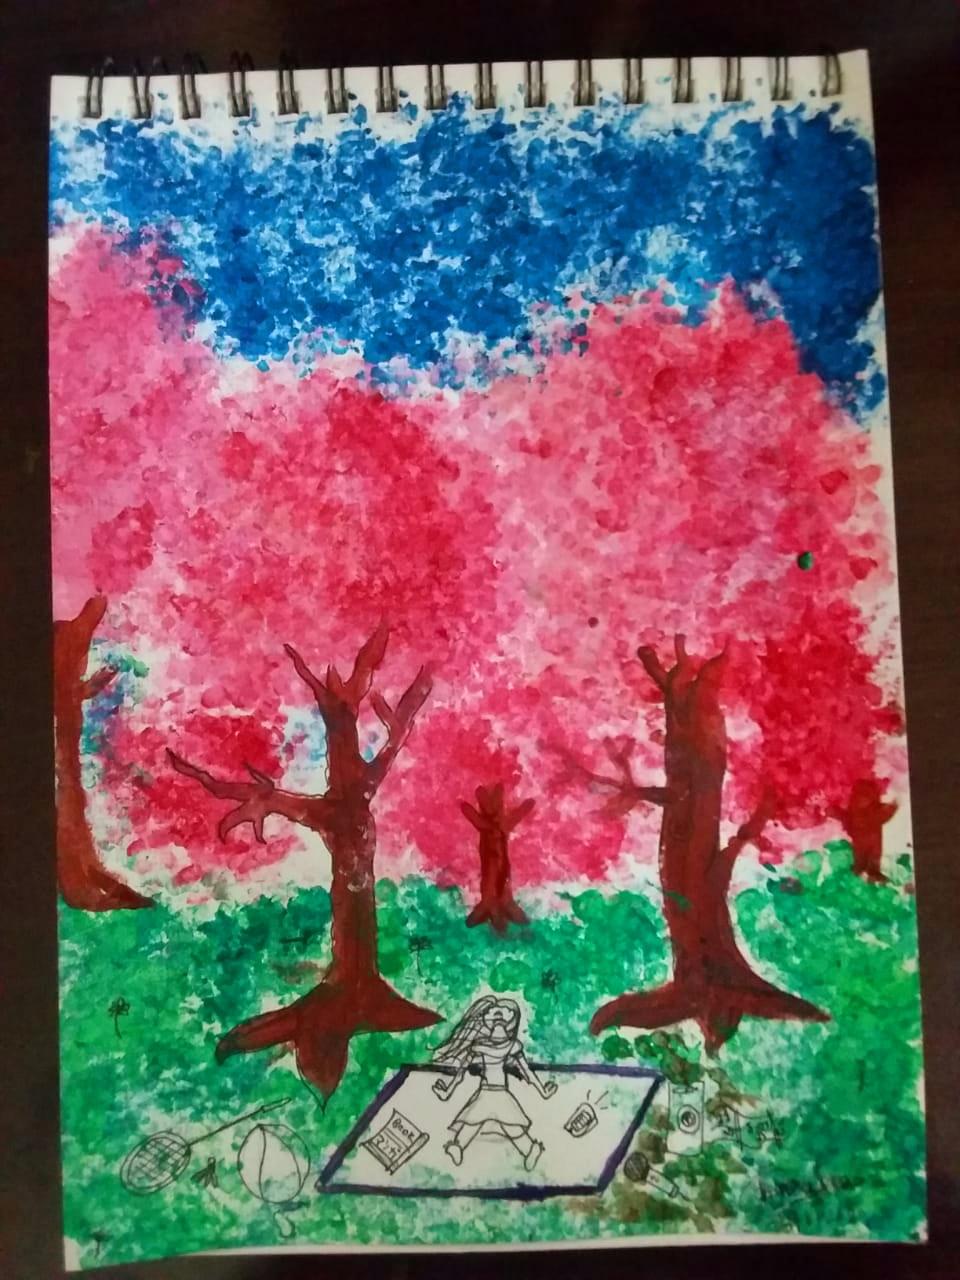 Artwork by Amraha Mohammad Tariq